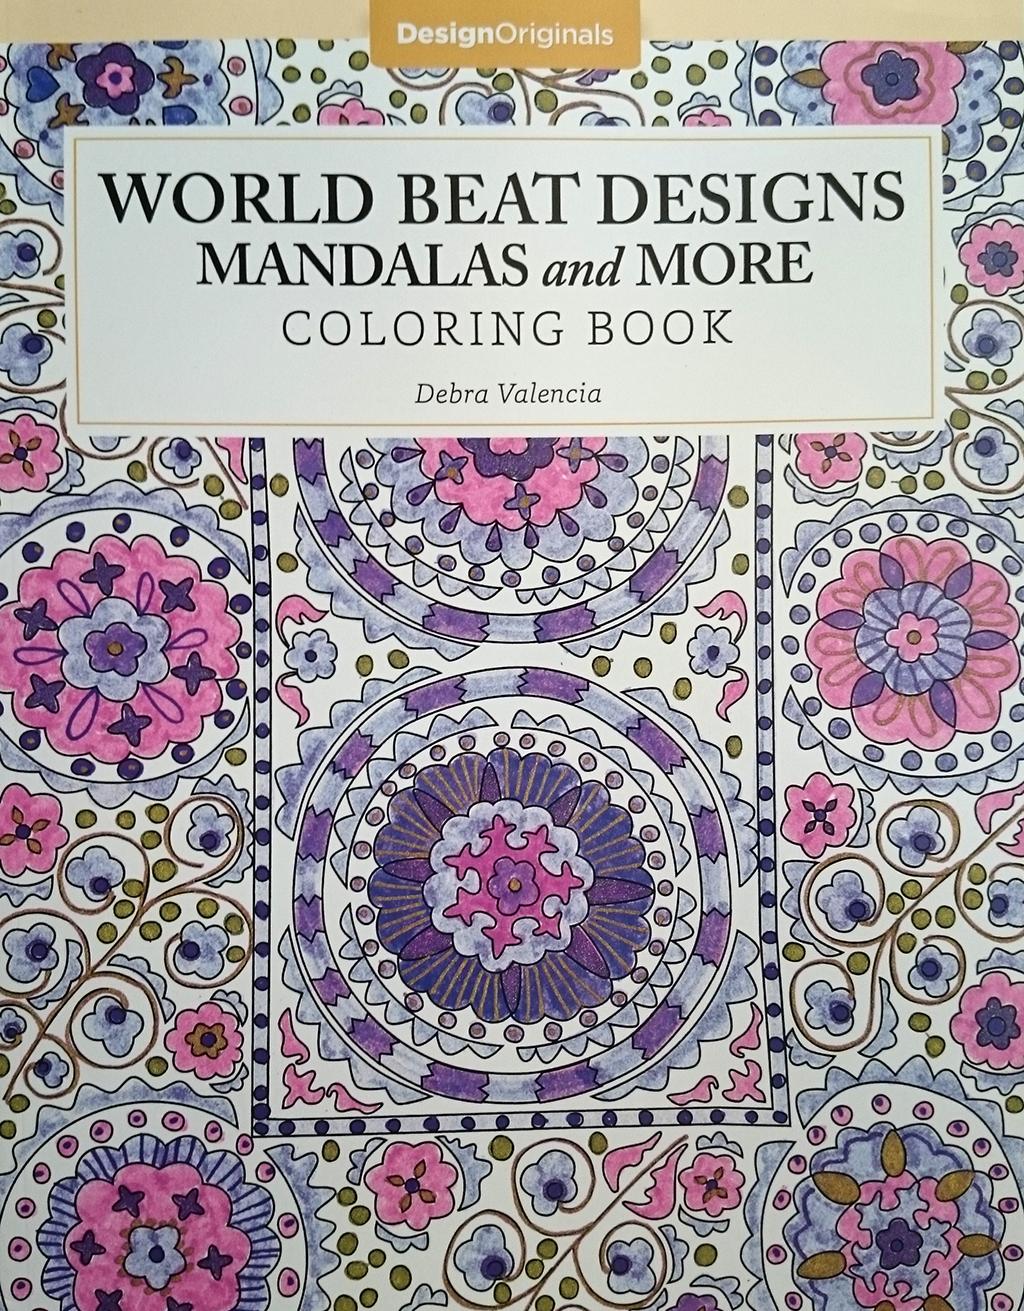 World-Beat-Designs-Mandalas-and-More-Coloring-Book-01